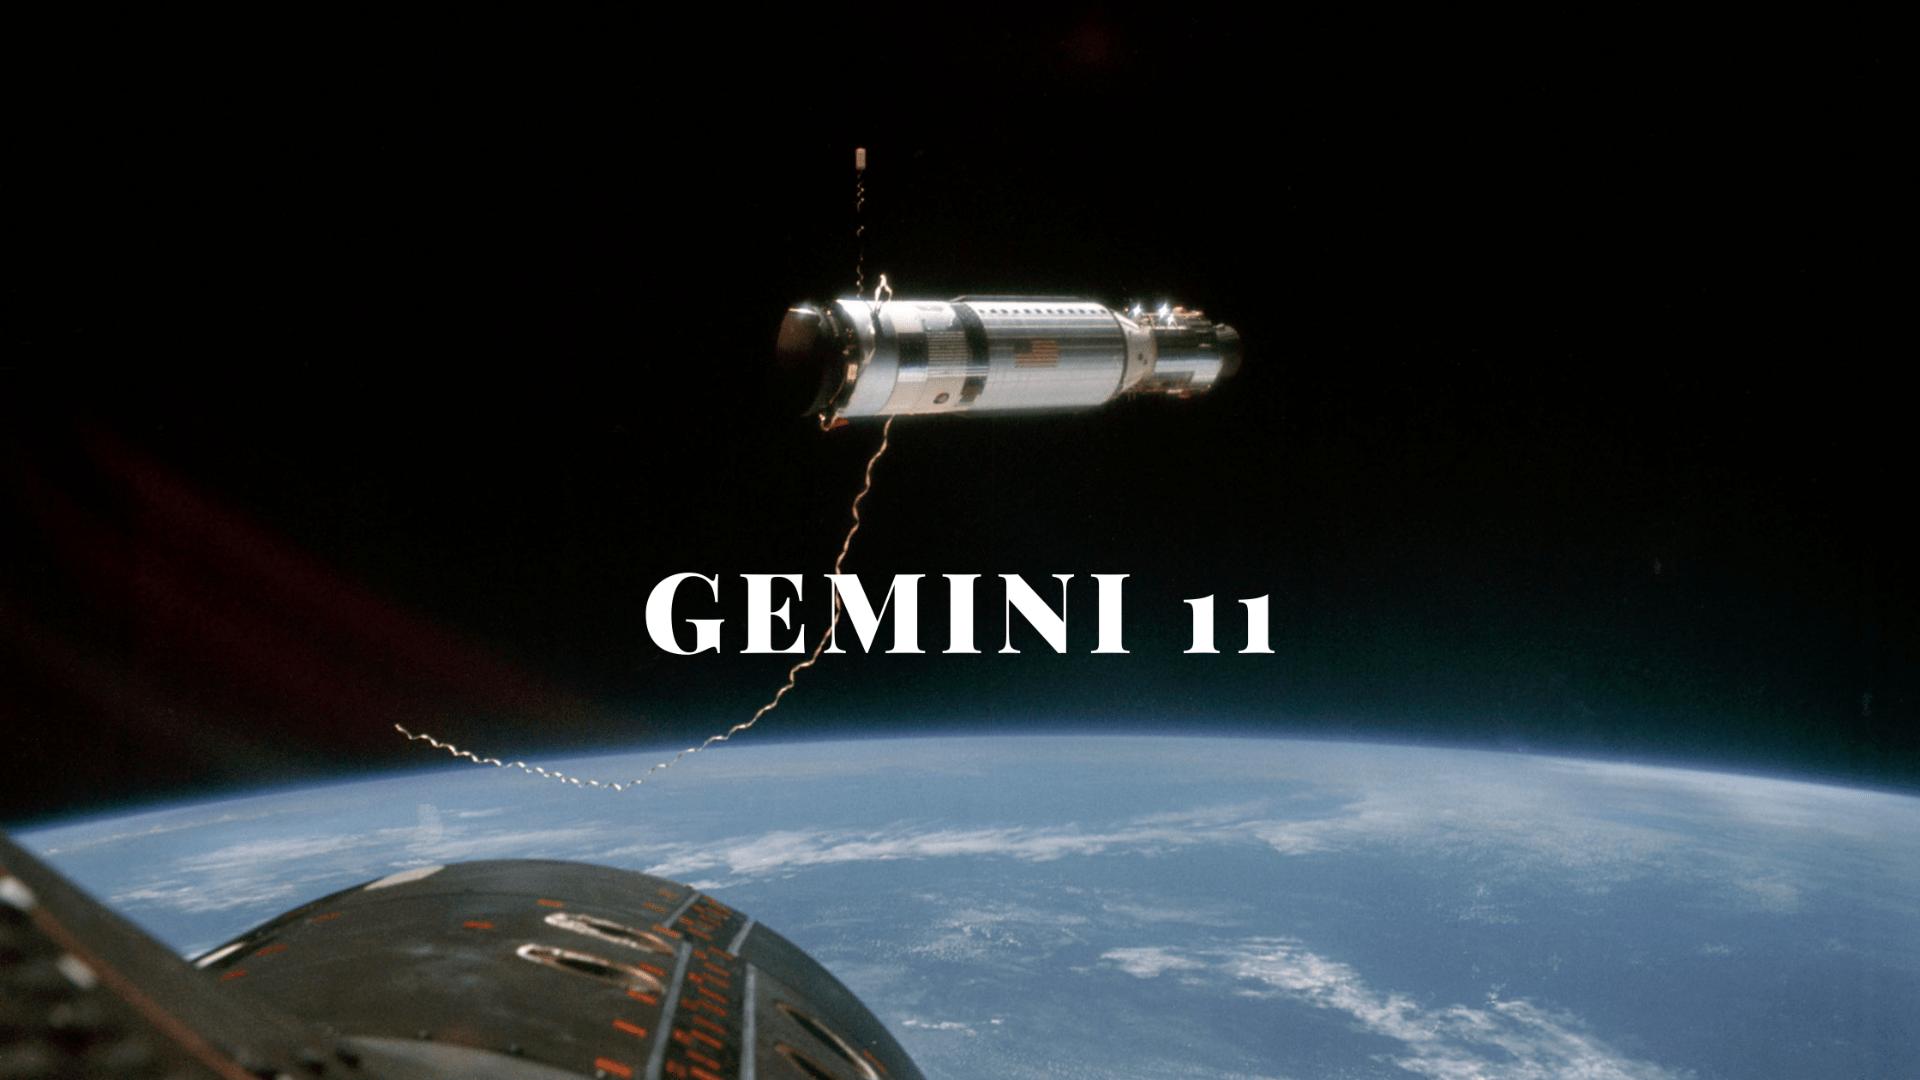 Gemini 11 header